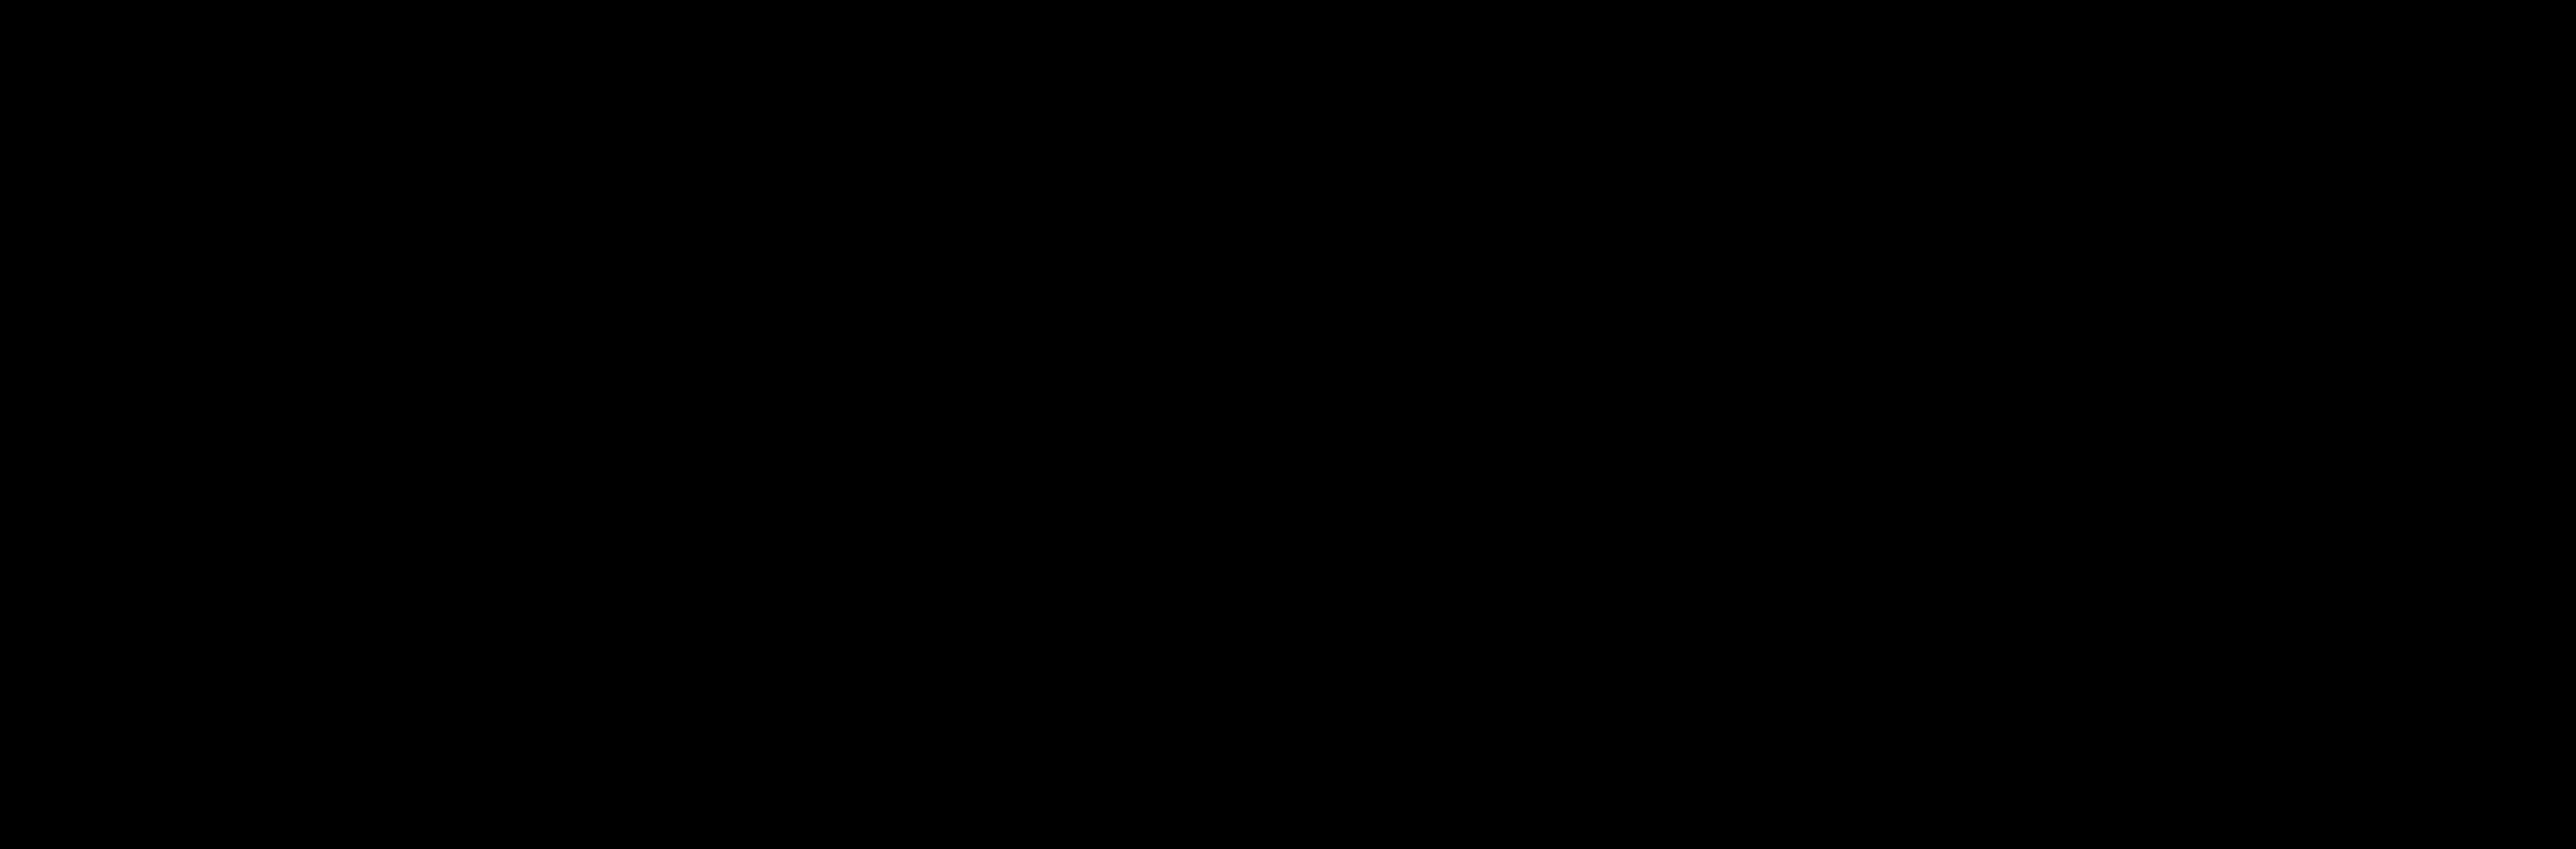 illustrated glossary of organic chemistry - chlorophyll, Skeleton